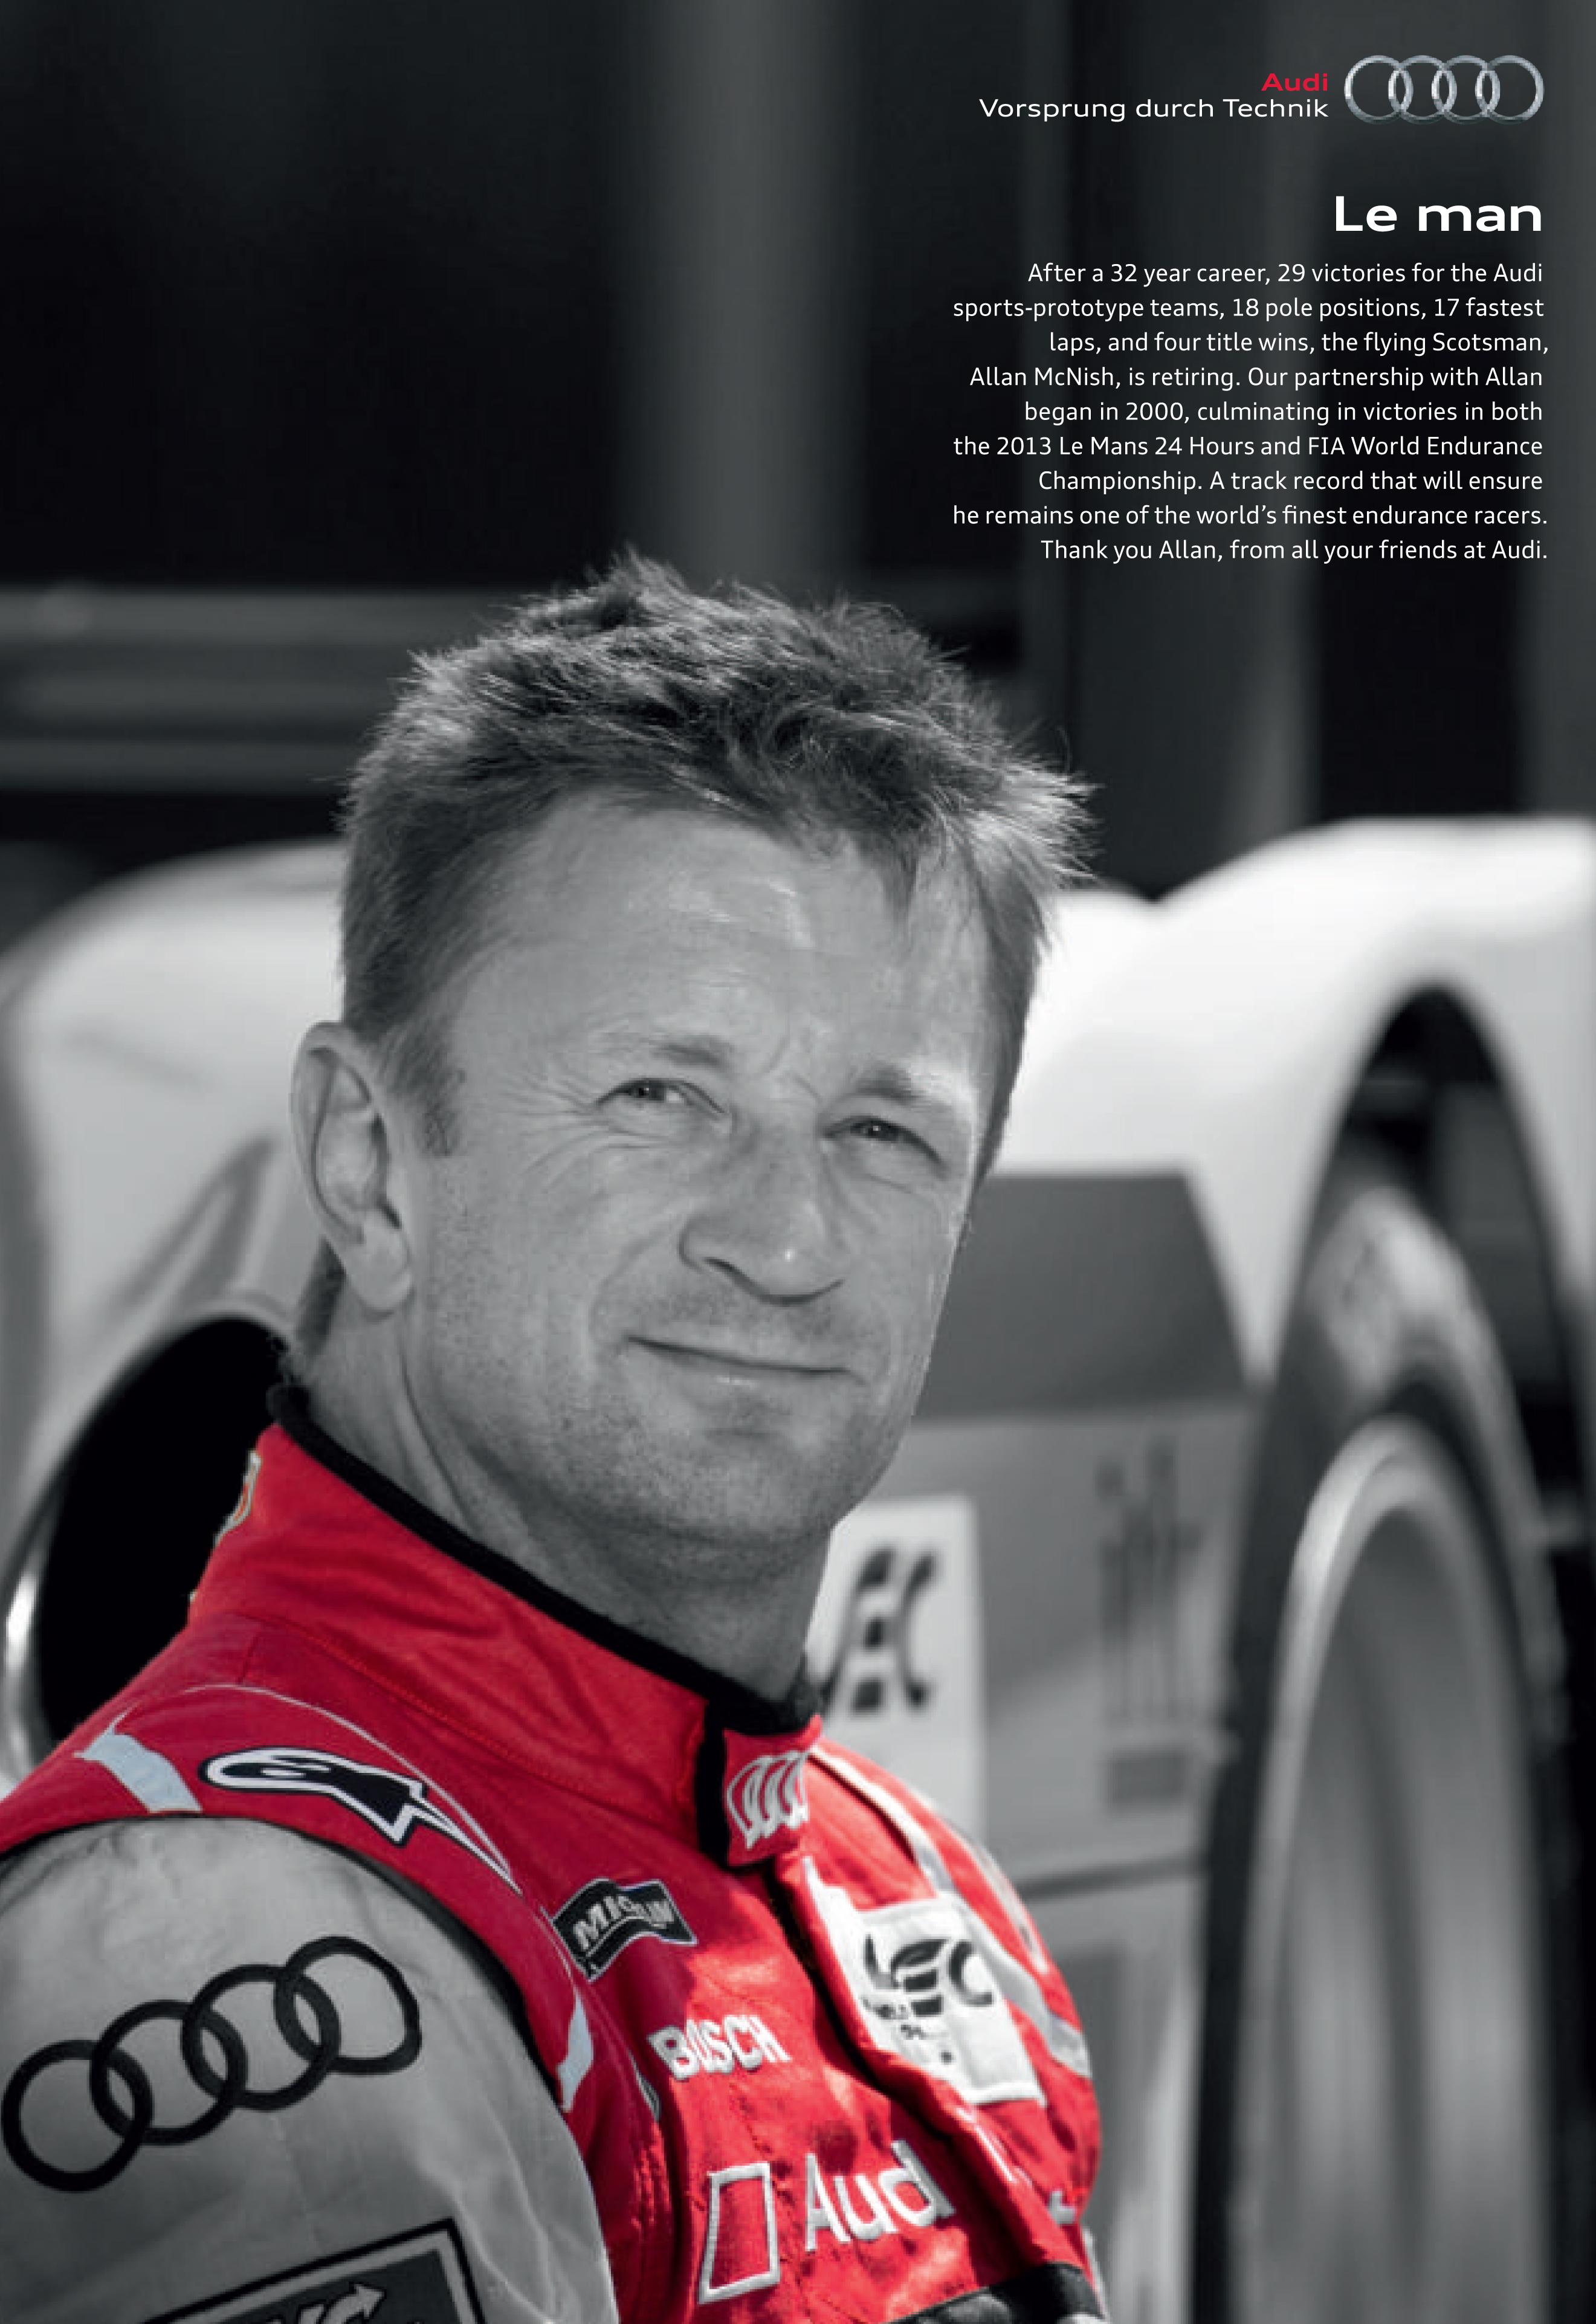 Audi's tribute to Allan McNish